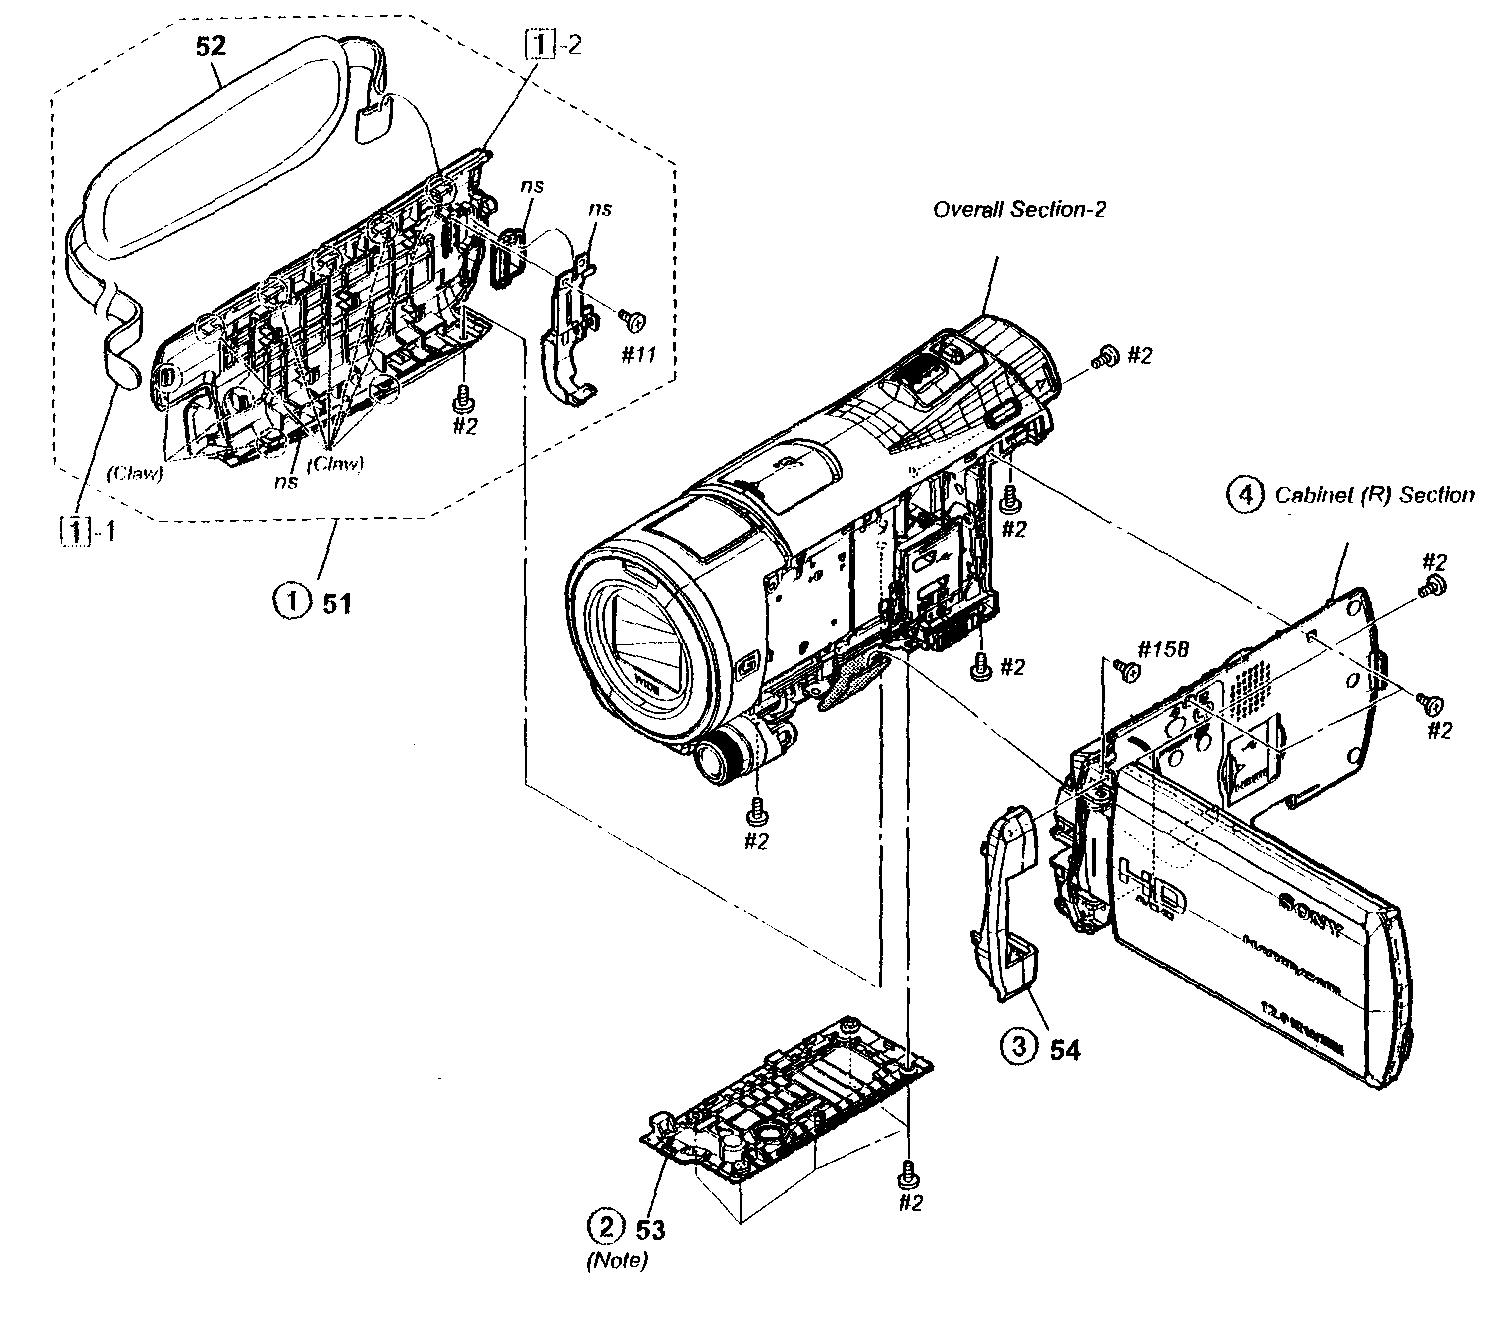 Sony model HDR-CX550V digital camcorder genuine parts